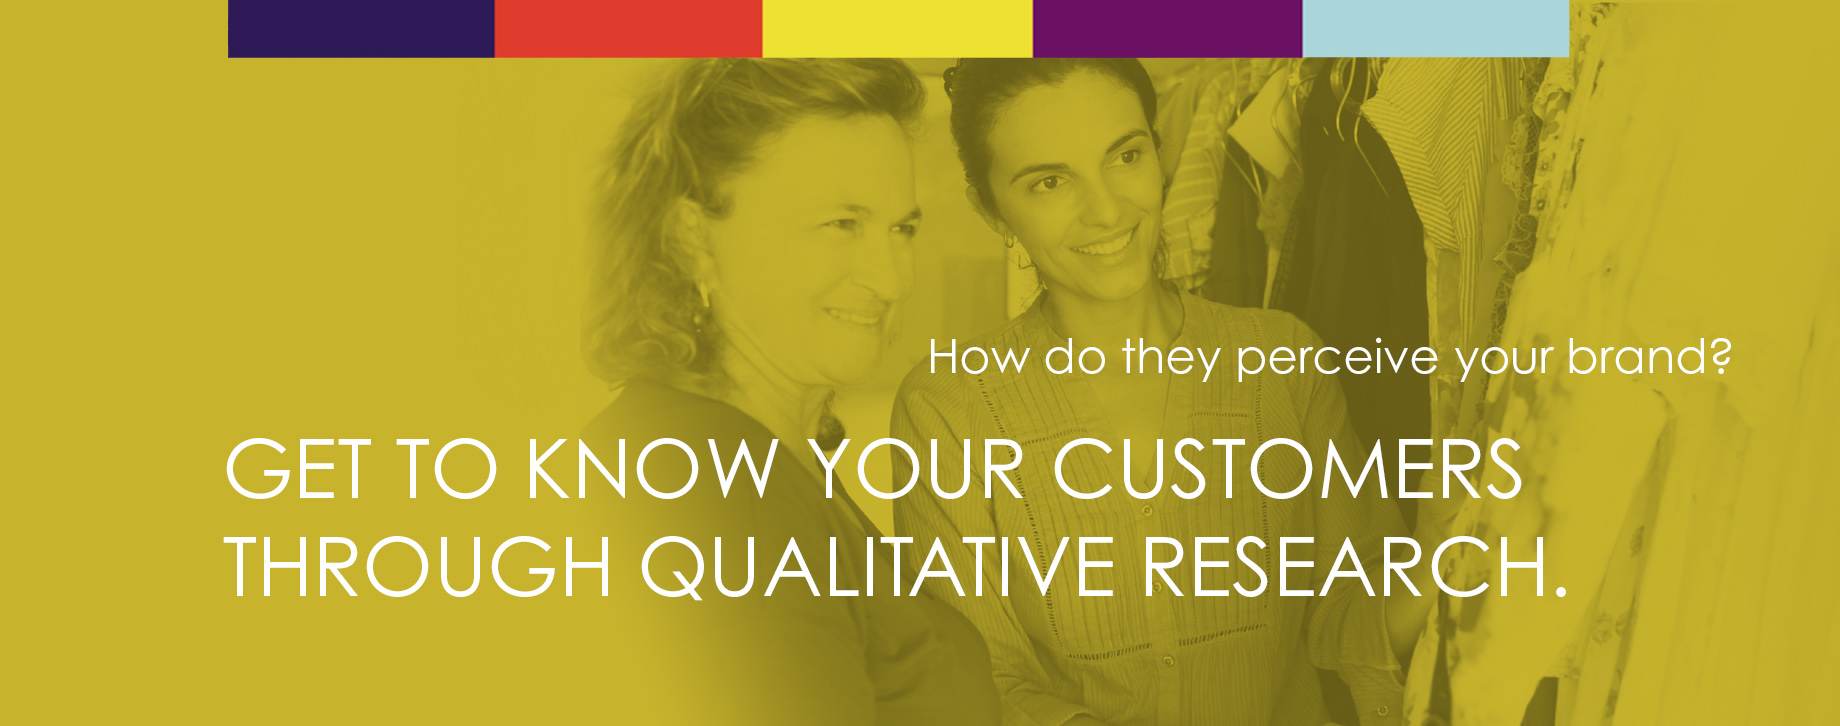 Clift Focus Group Moderator - Qualitative Research 03.jpg